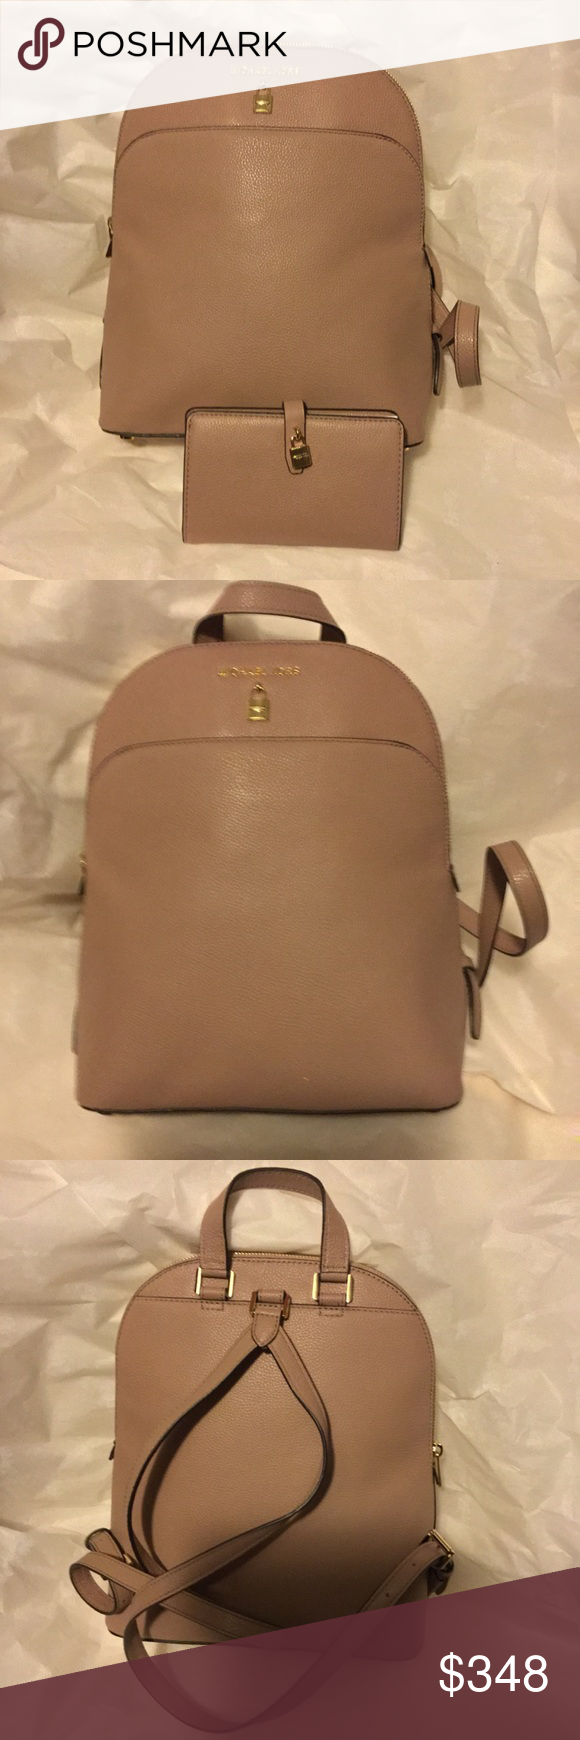 01c1ccfa3c03 MK Adele Fawn LG Leather Backpack bifold Wallet MSRP: $368.00 Bag $148.00  Wallet Top zip